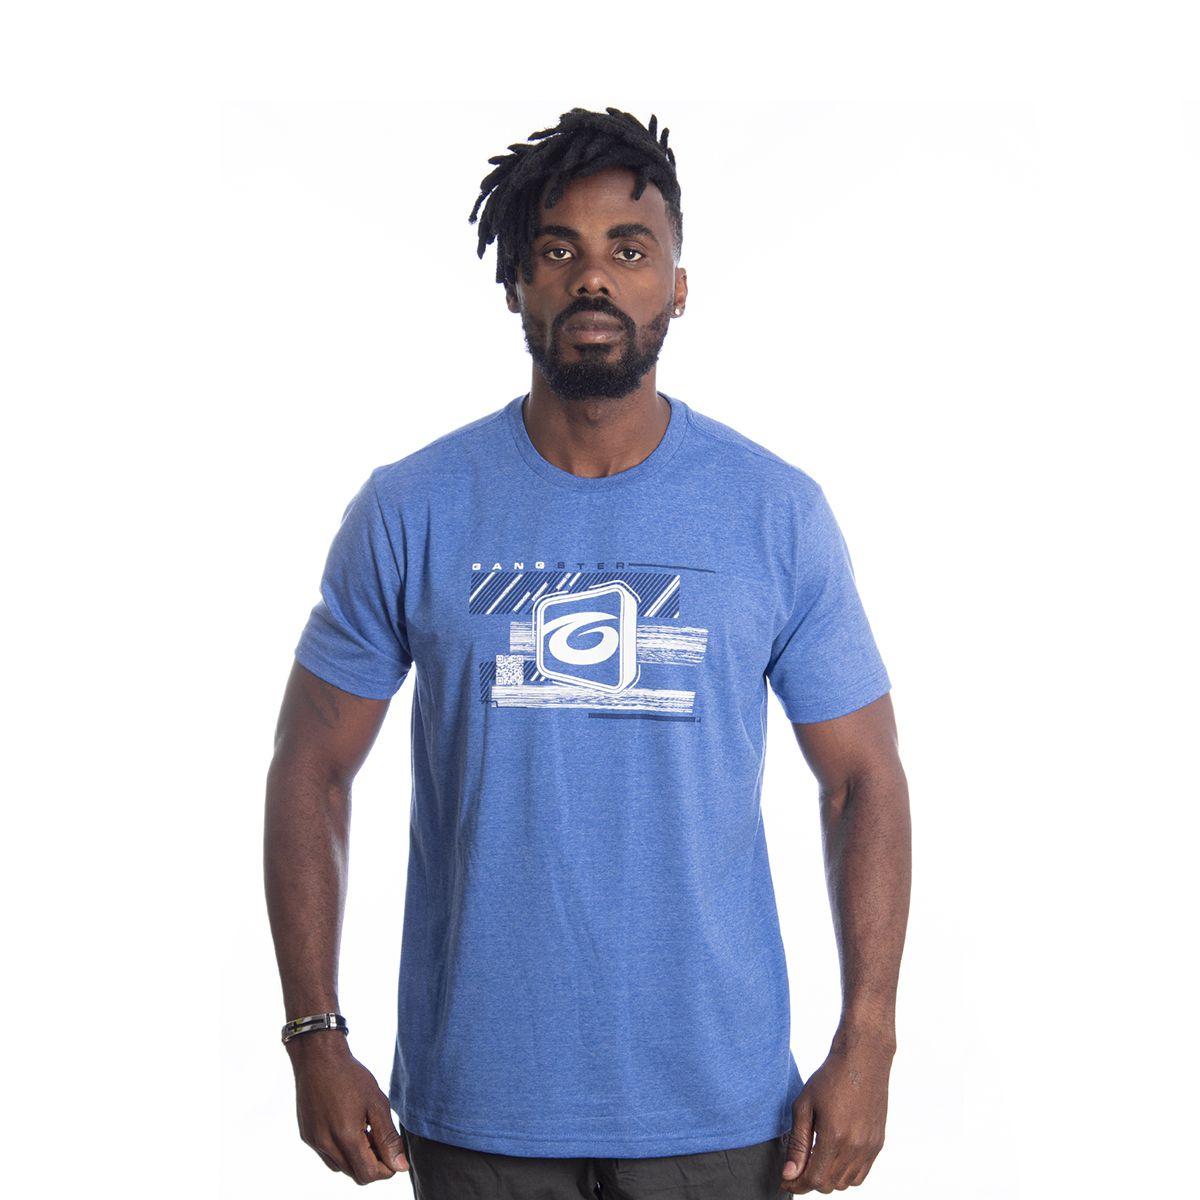 Camiseta Masculina Básica Estampada Gangster 10.01.9513